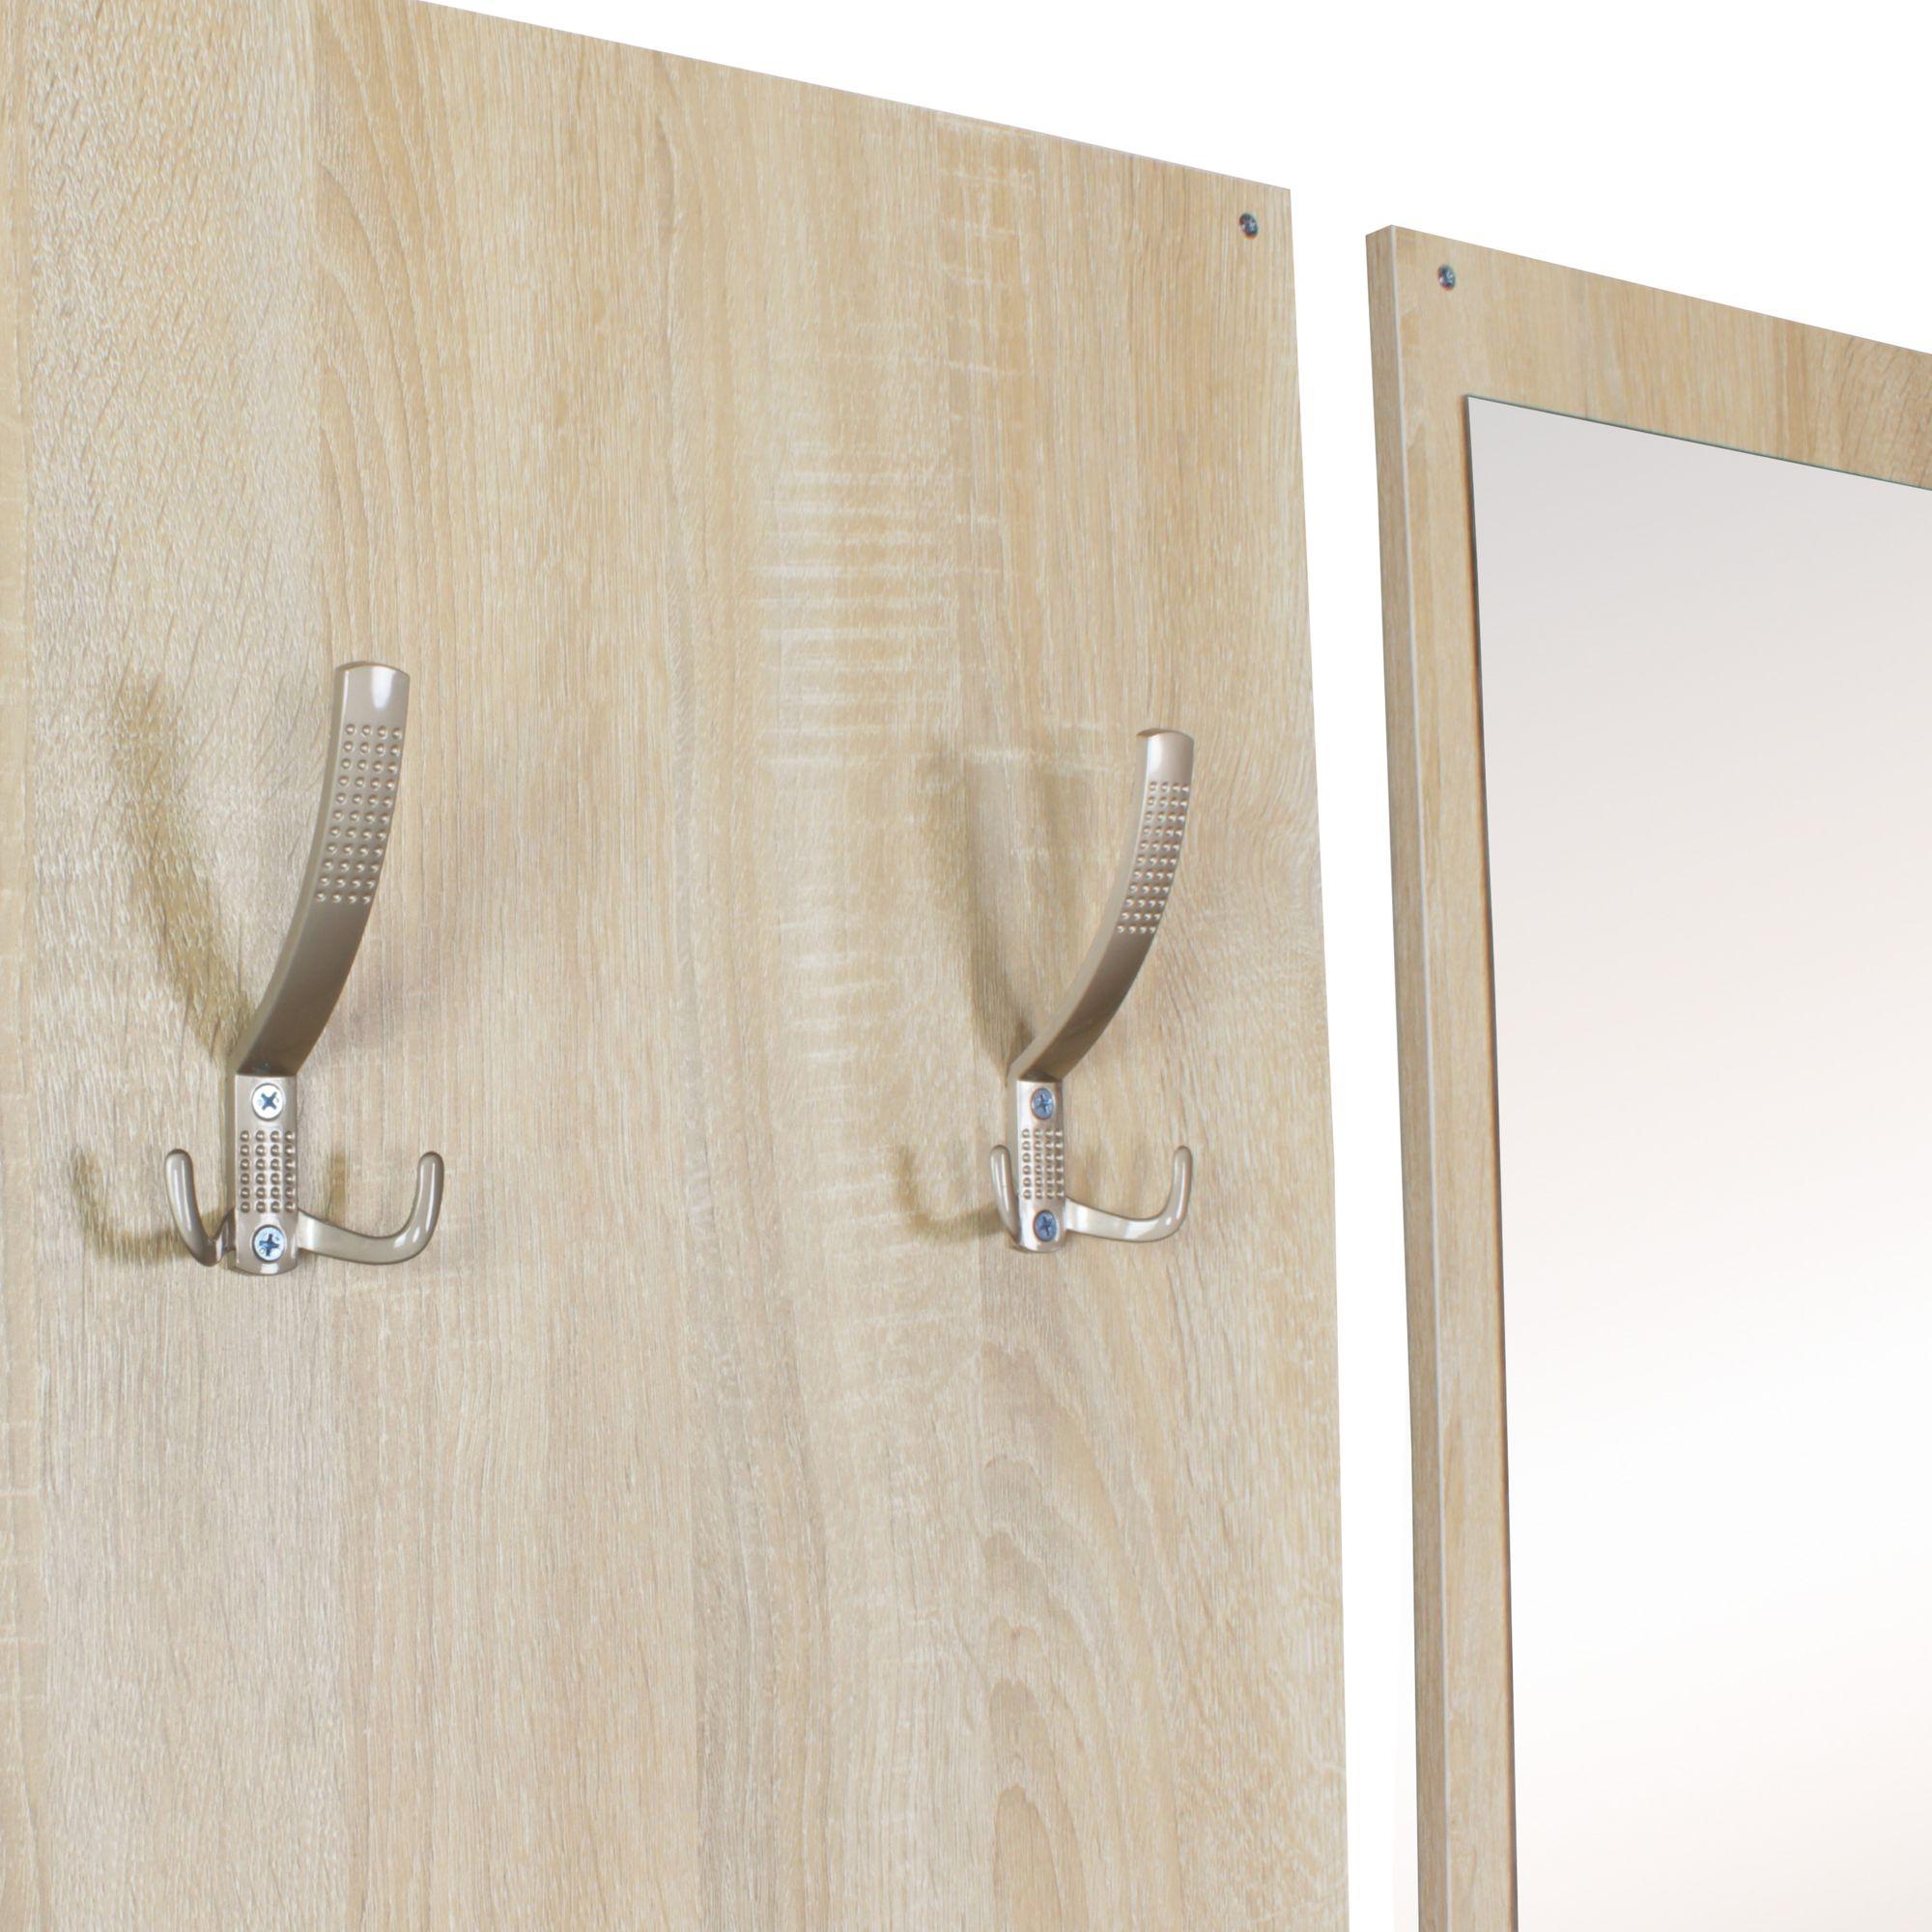 garderobe flurgarderobe paneel wandgarderobe spiegel komplett set kompakt sonoma ebay. Black Bedroom Furniture Sets. Home Design Ideas